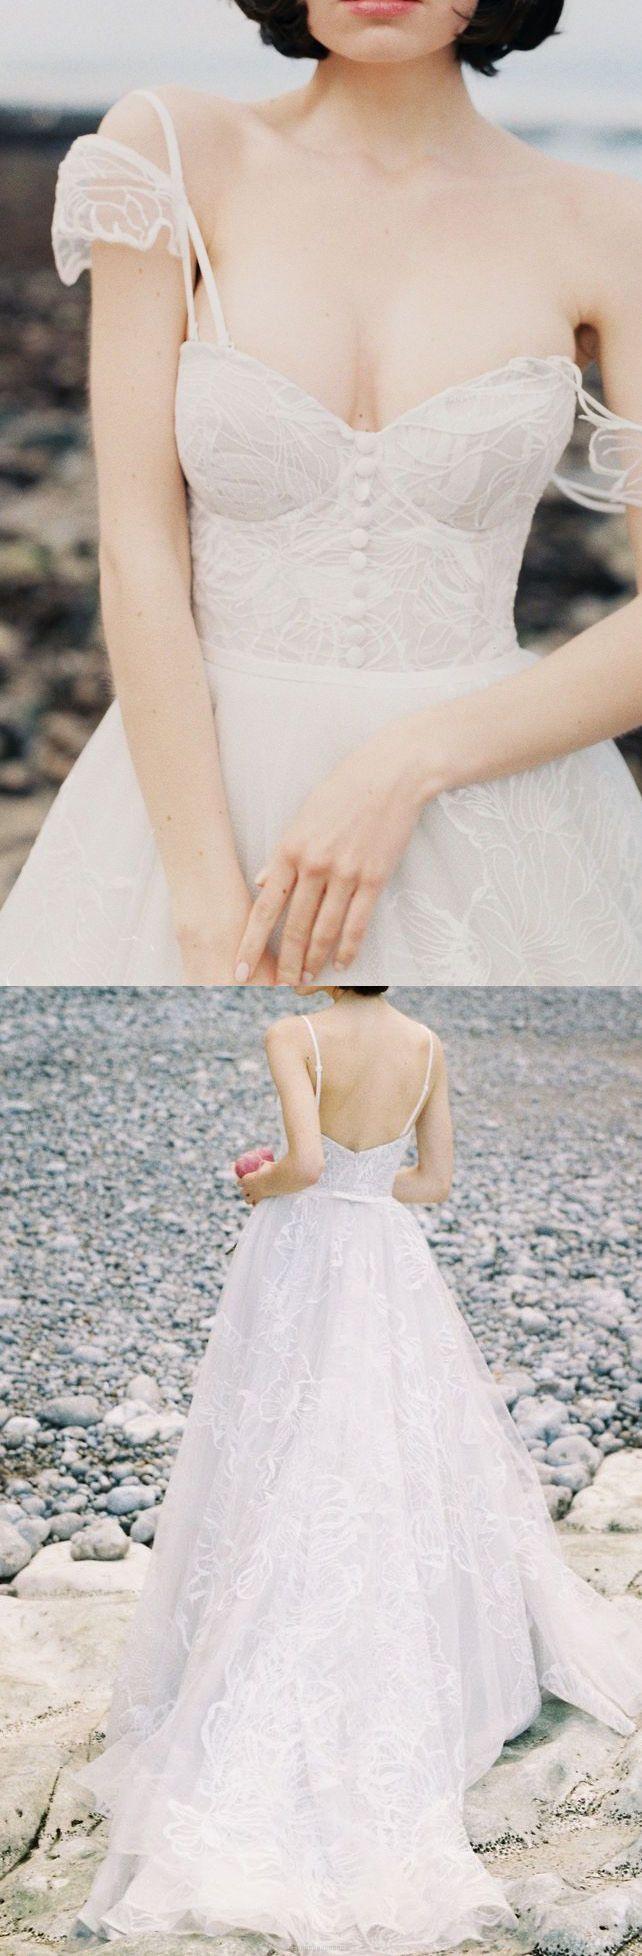 Cheap lace wedding dresses long train wedding dresses wedding